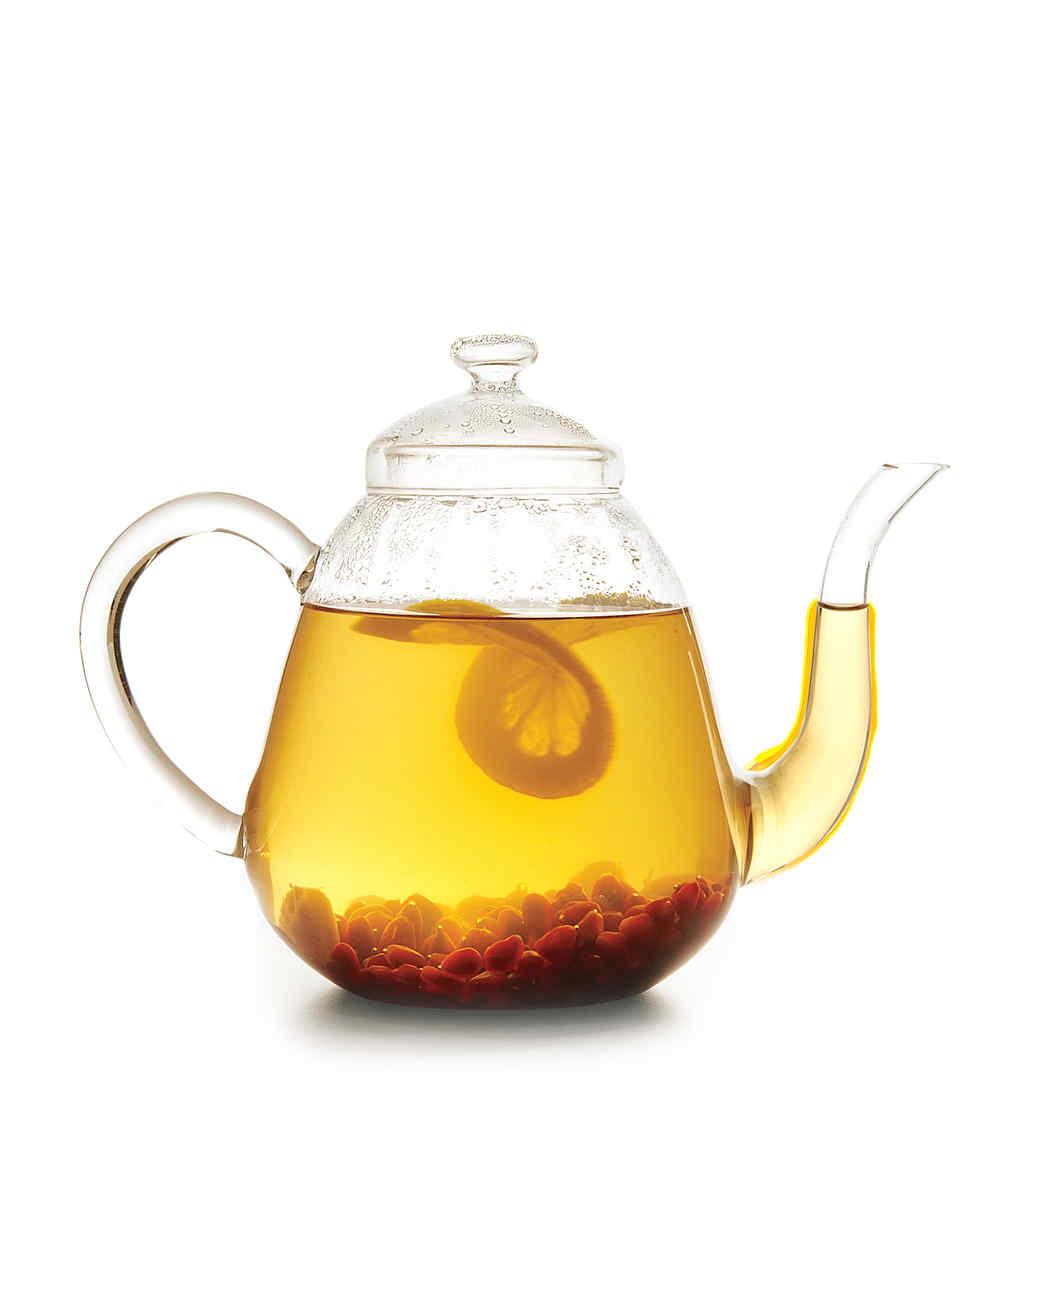 teapot-mbd106530.jpg